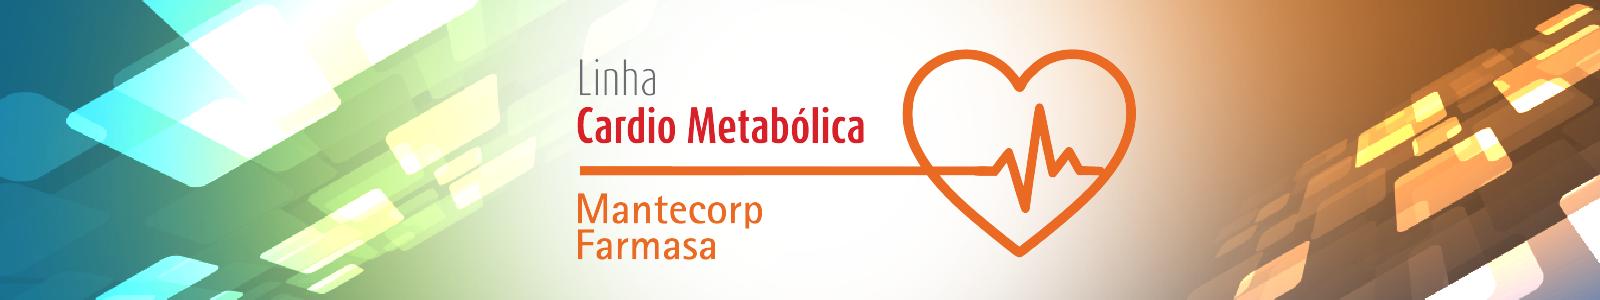 banner-mantecorp-cardio